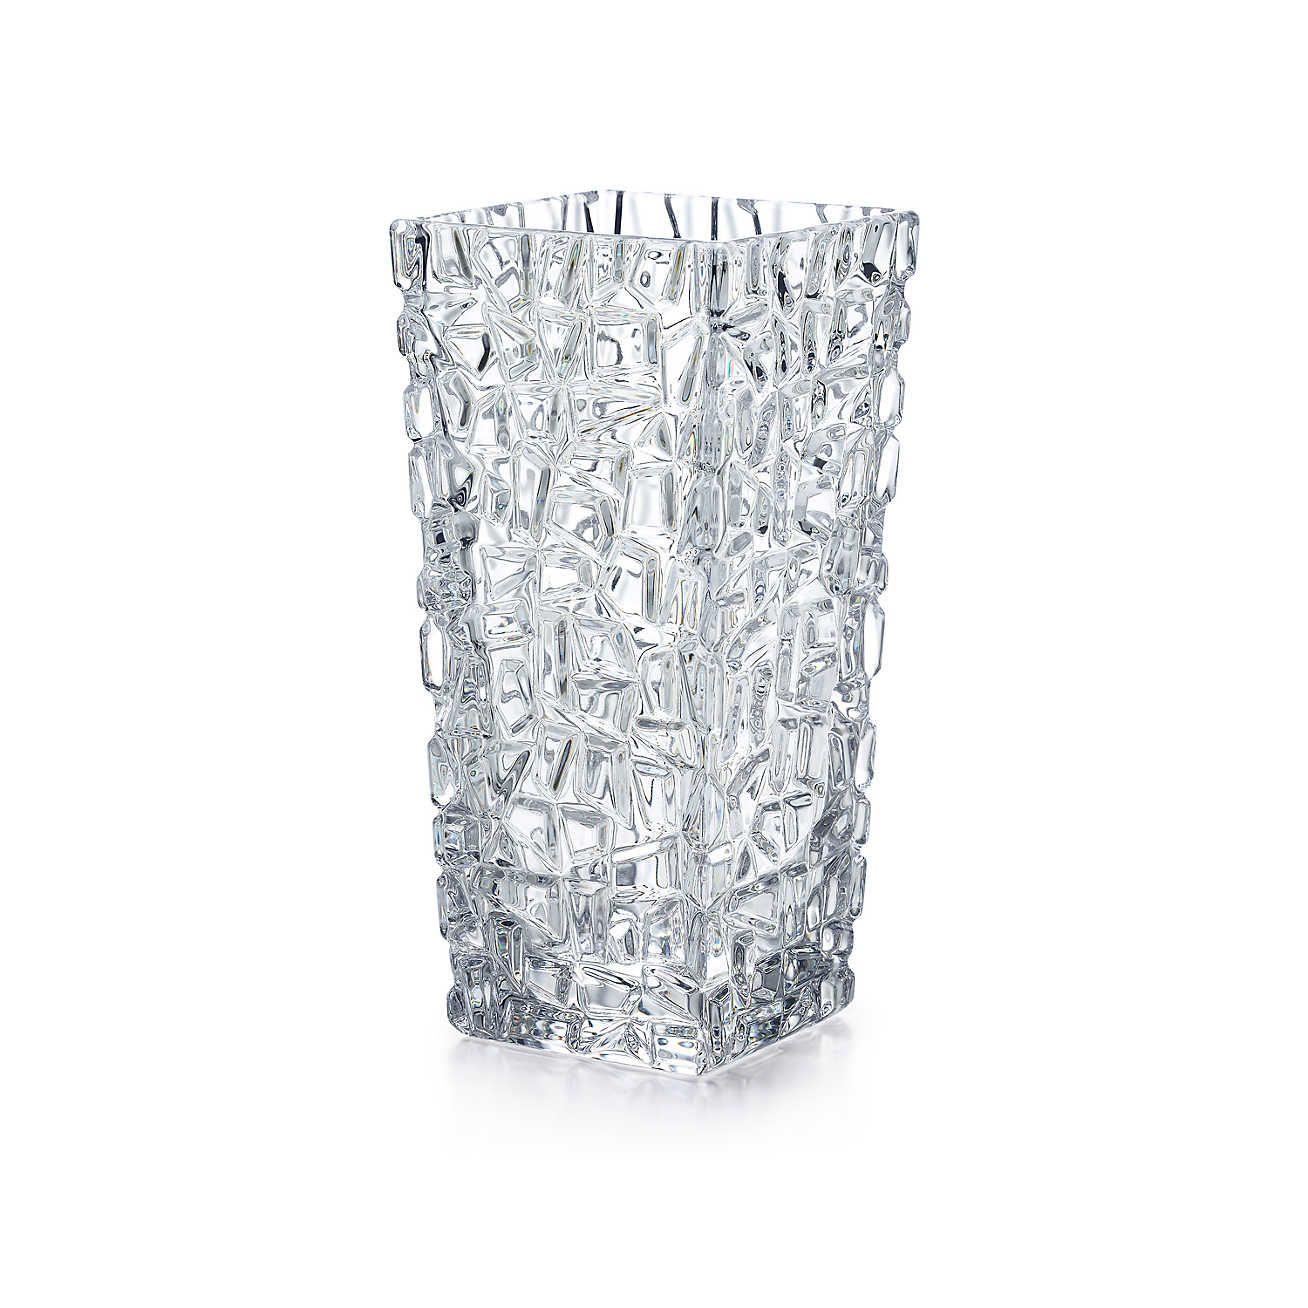 Tiffany sierrasquare vase squares tiffany sierrasquare vase reviewsmspy